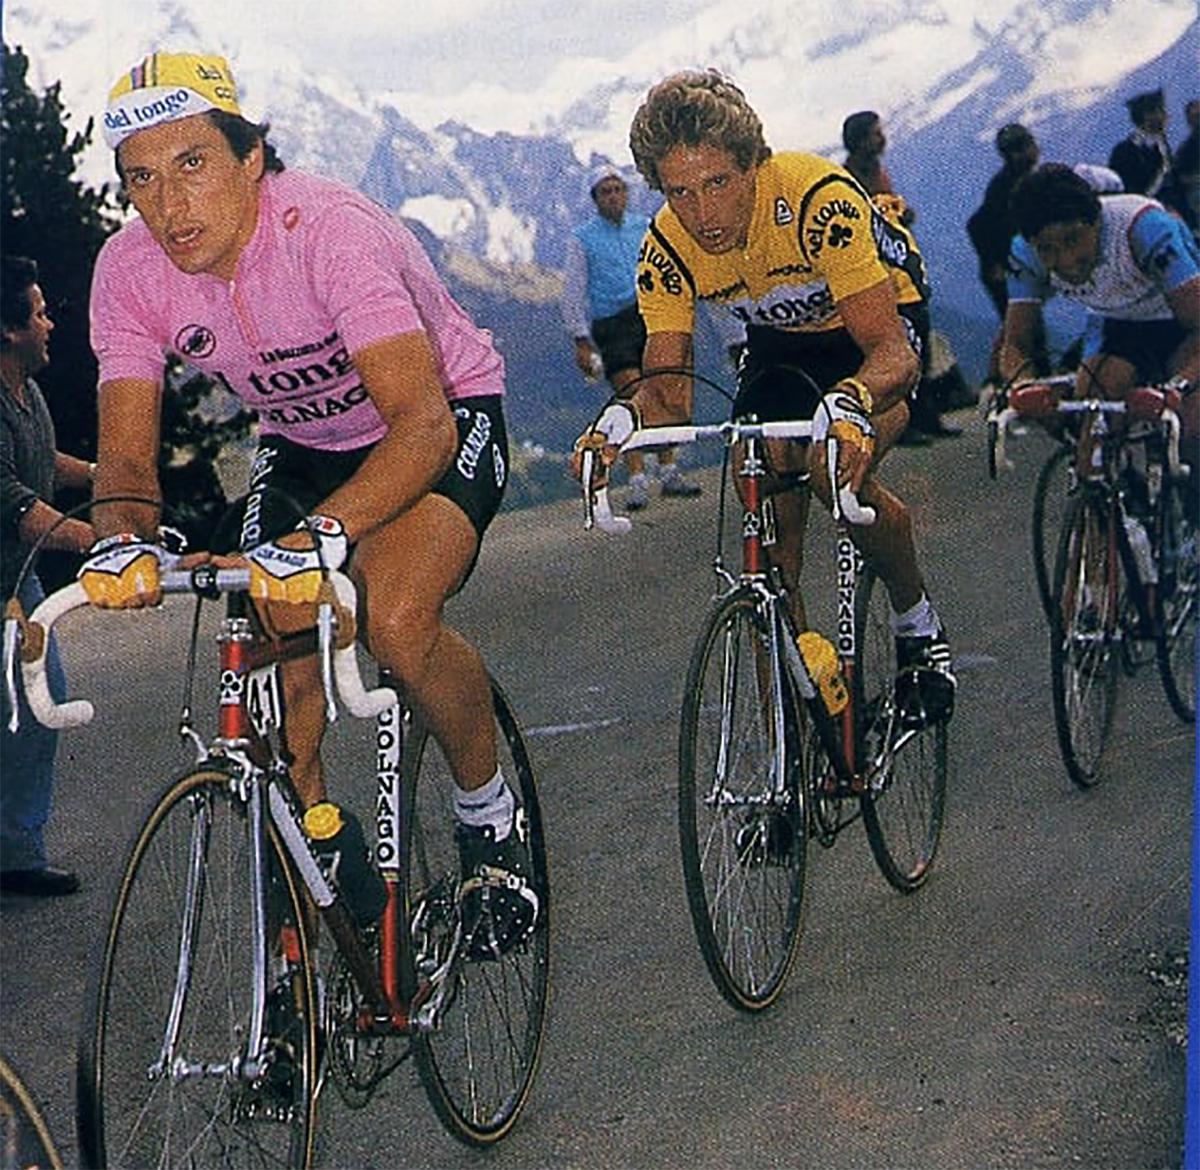 Giuseppe Saronni durante il Giro d'Italia 1983